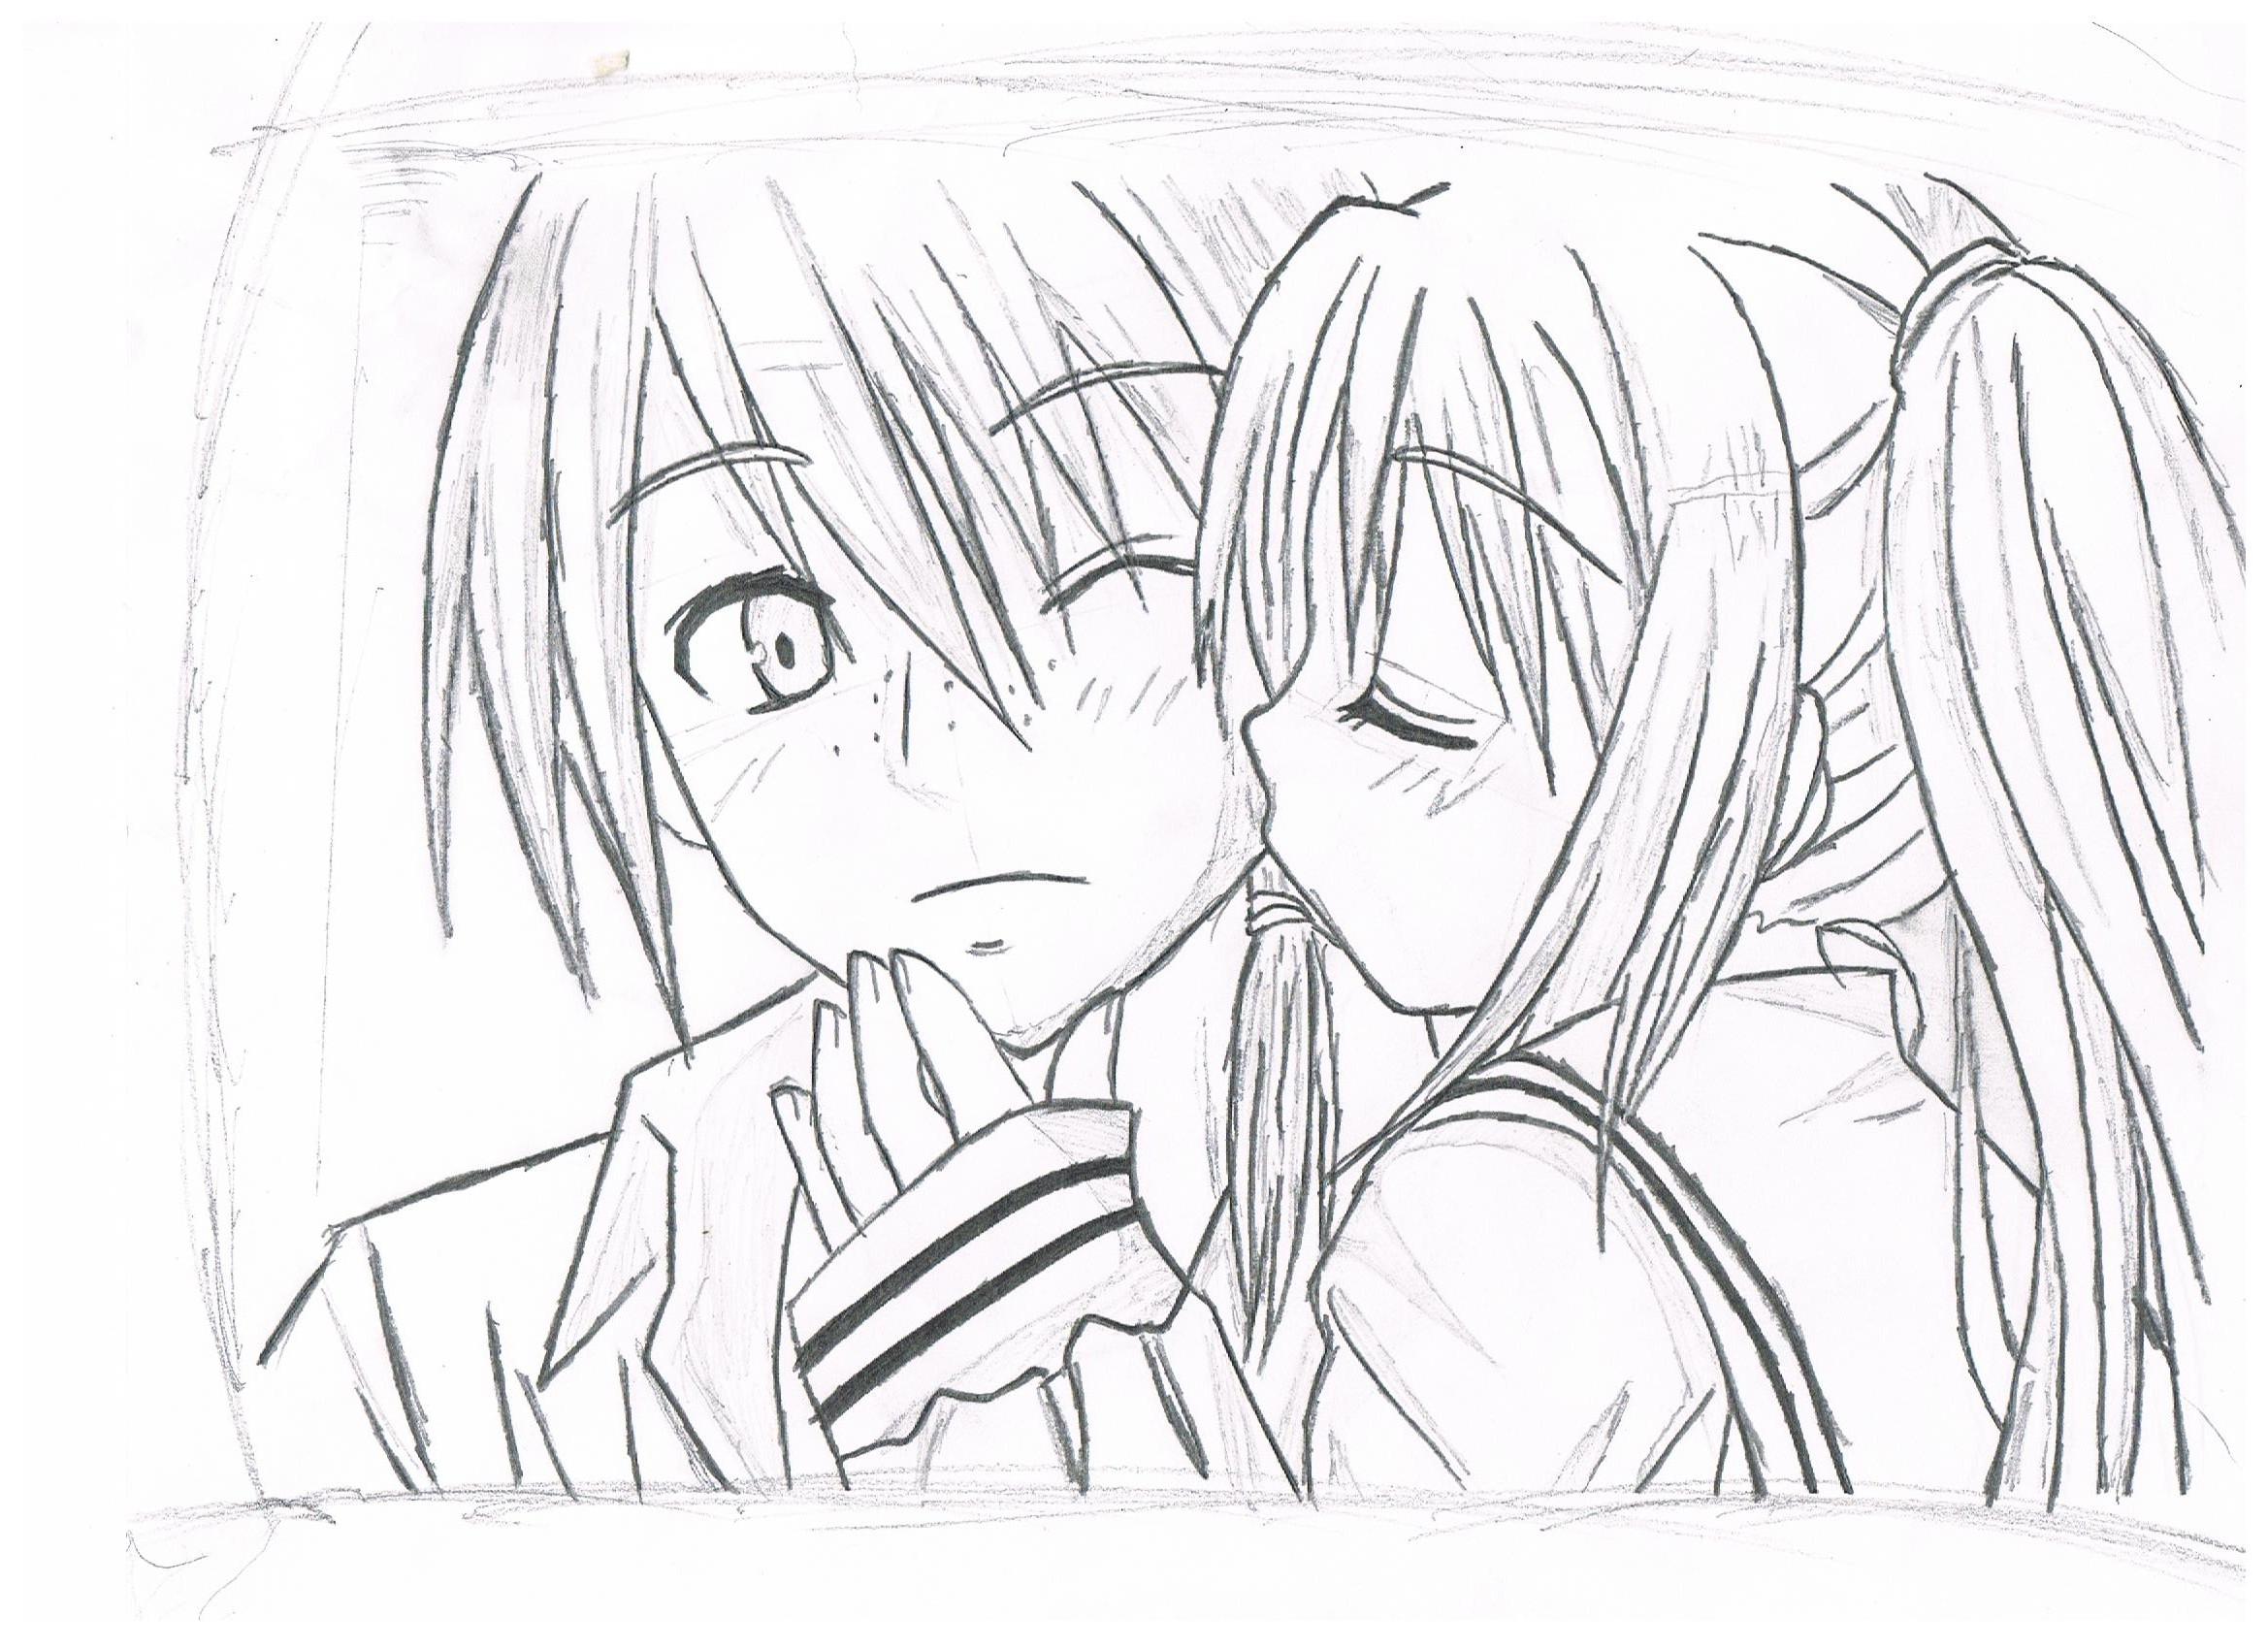 2338x1700 Anime Boy And Girl Drawing A Boy Girl Anime For Sketching Pencil